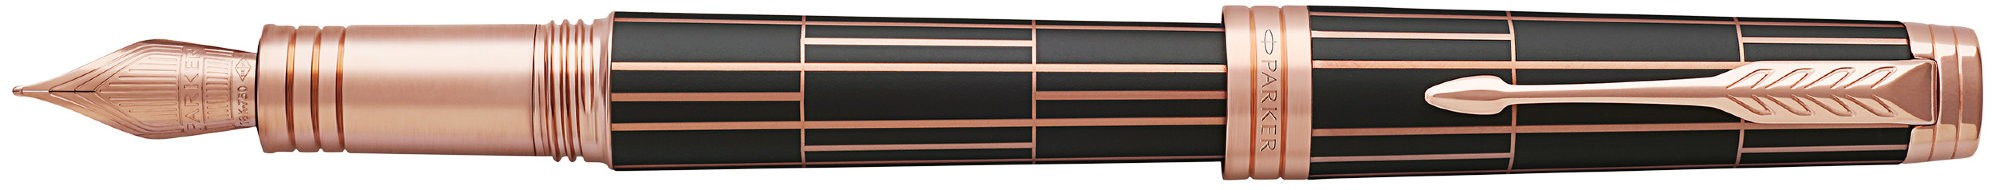 Перьевая ручка Parker Premier F565 Luxury Brown PG в Воронеже